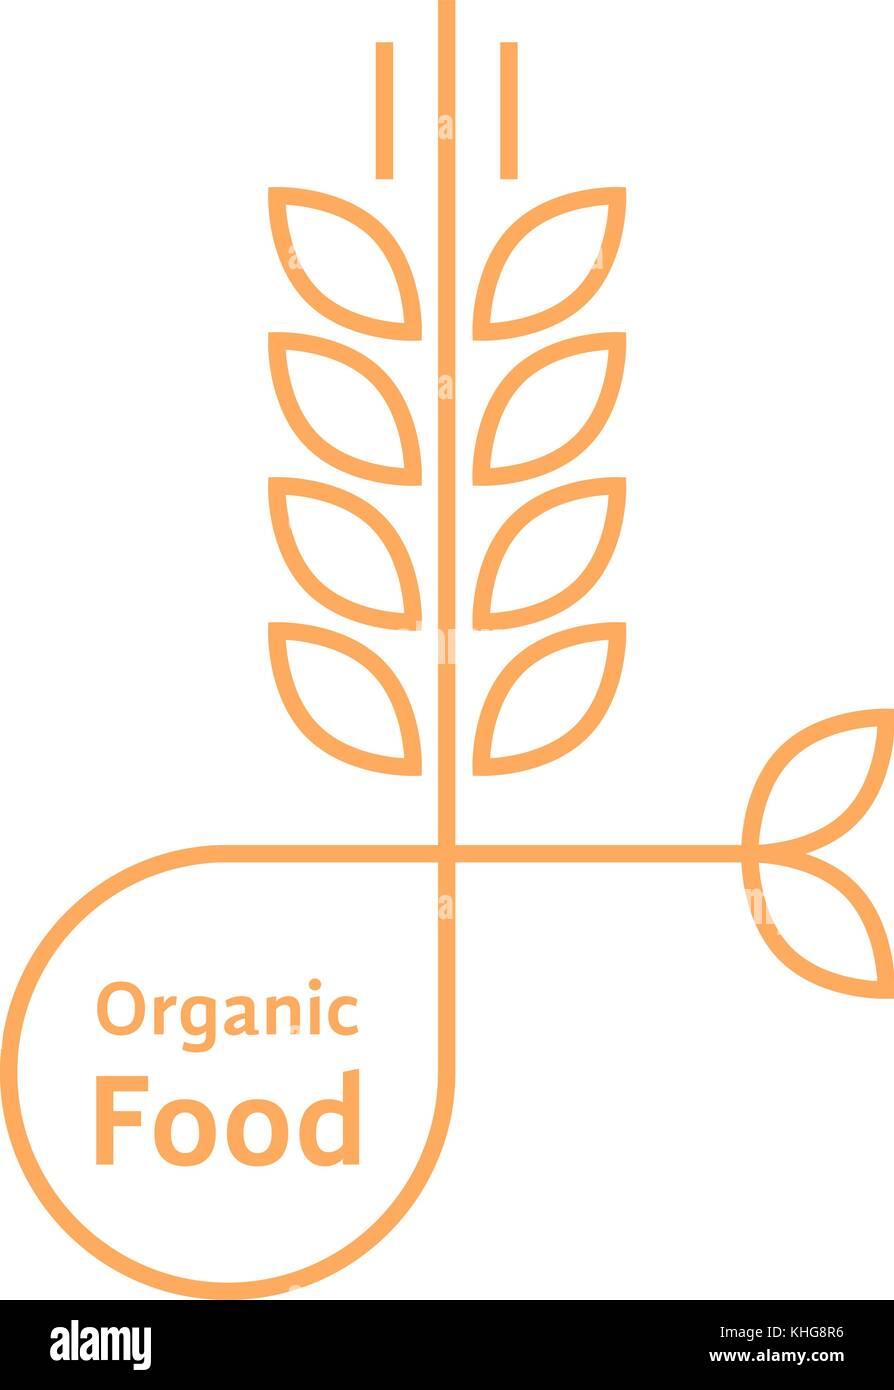 orange organic food logo like wheat ears - Stock Vector